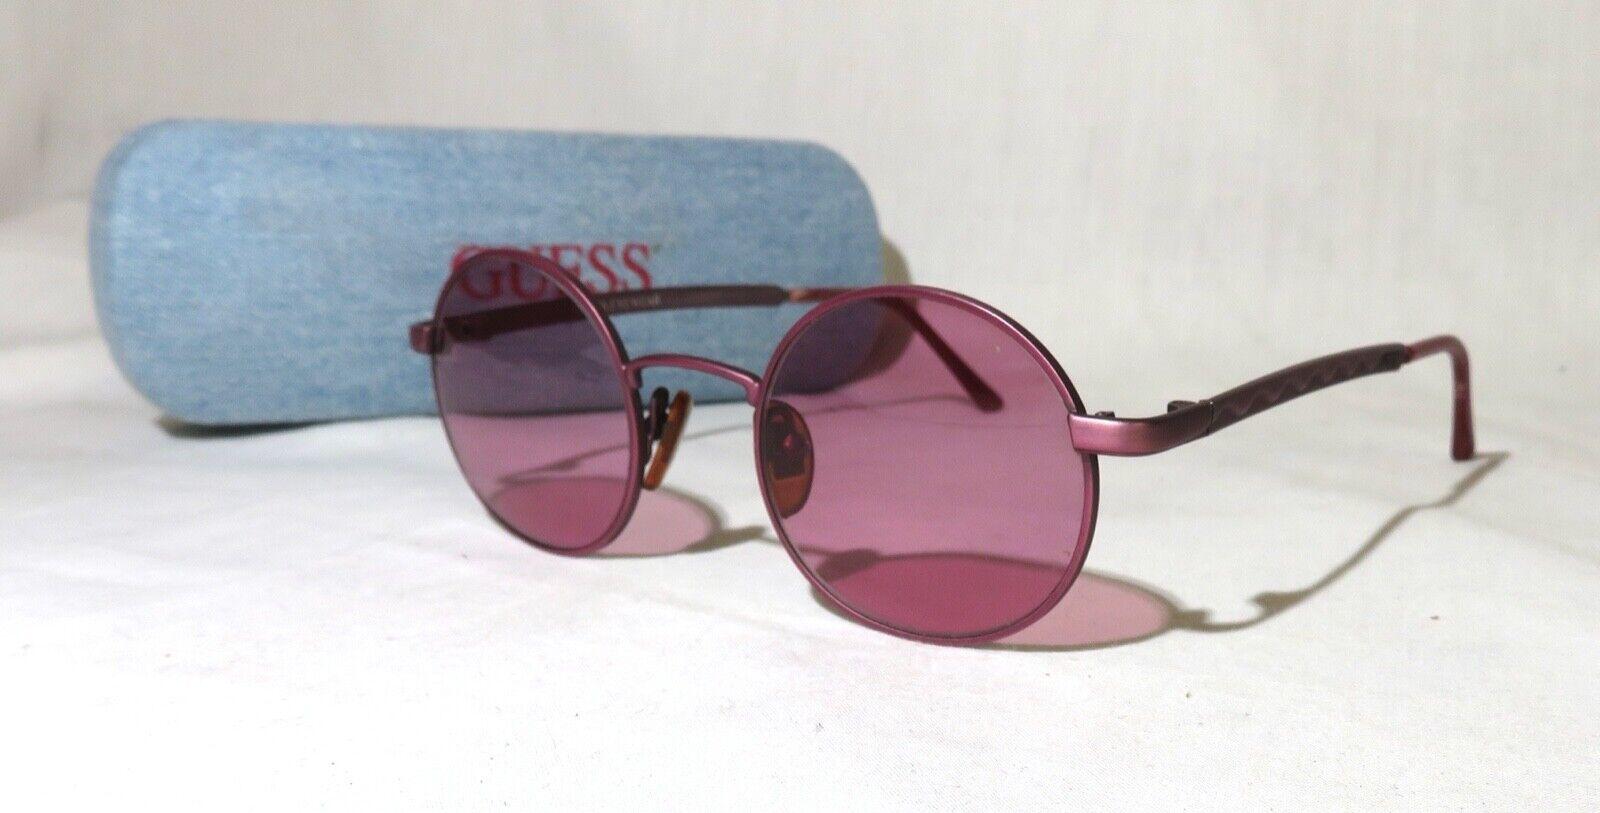 Guess Eyewear GU731 Sunglasses, Mauve pink metal frame, 44-21-135